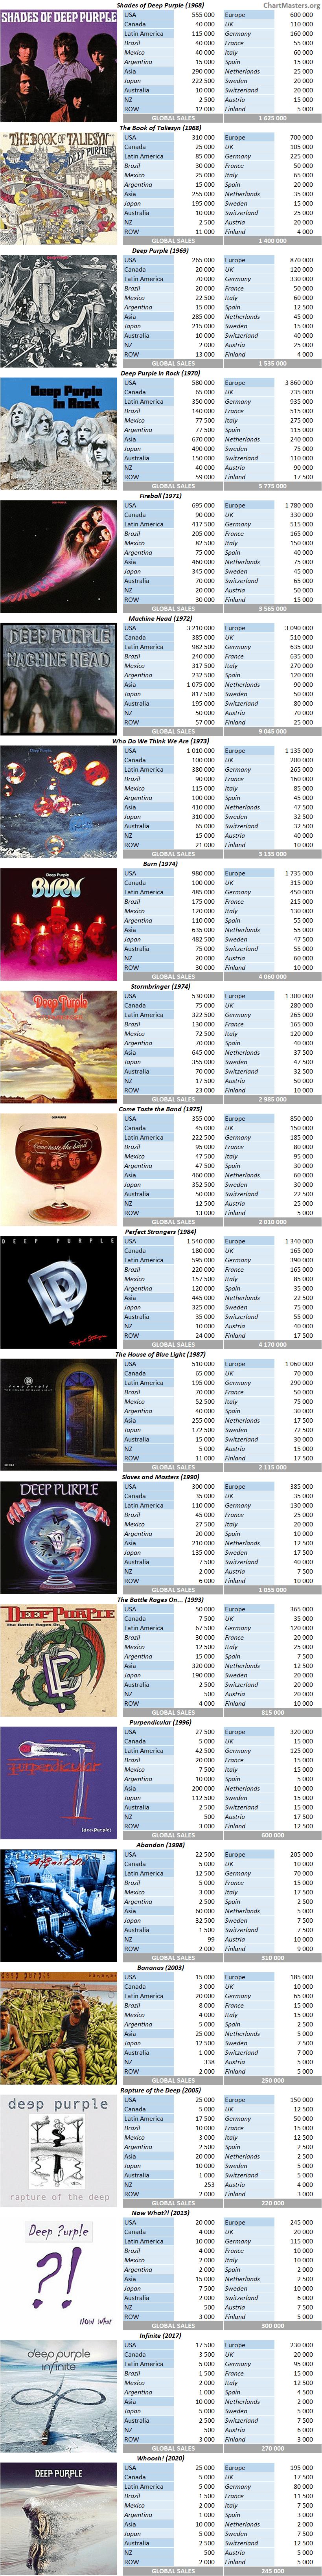 CSPC Deep Purple album sales breakdown